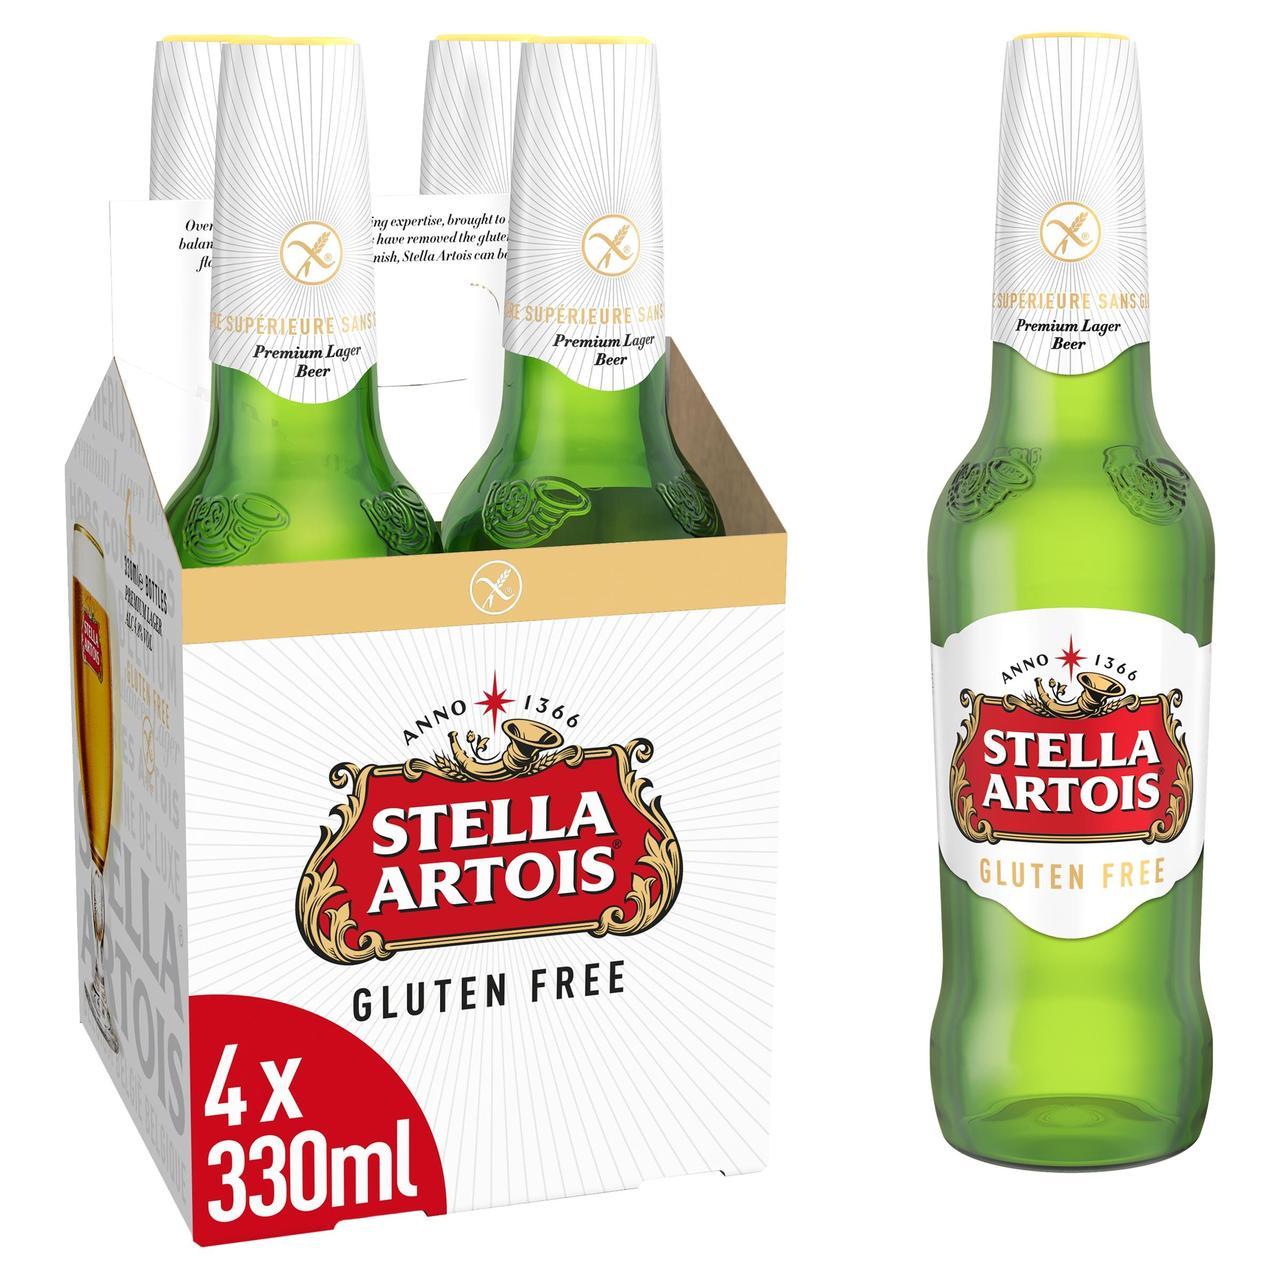 Stella Artois Gluten Free 330ml x 4 pack £3.50 at Ocado